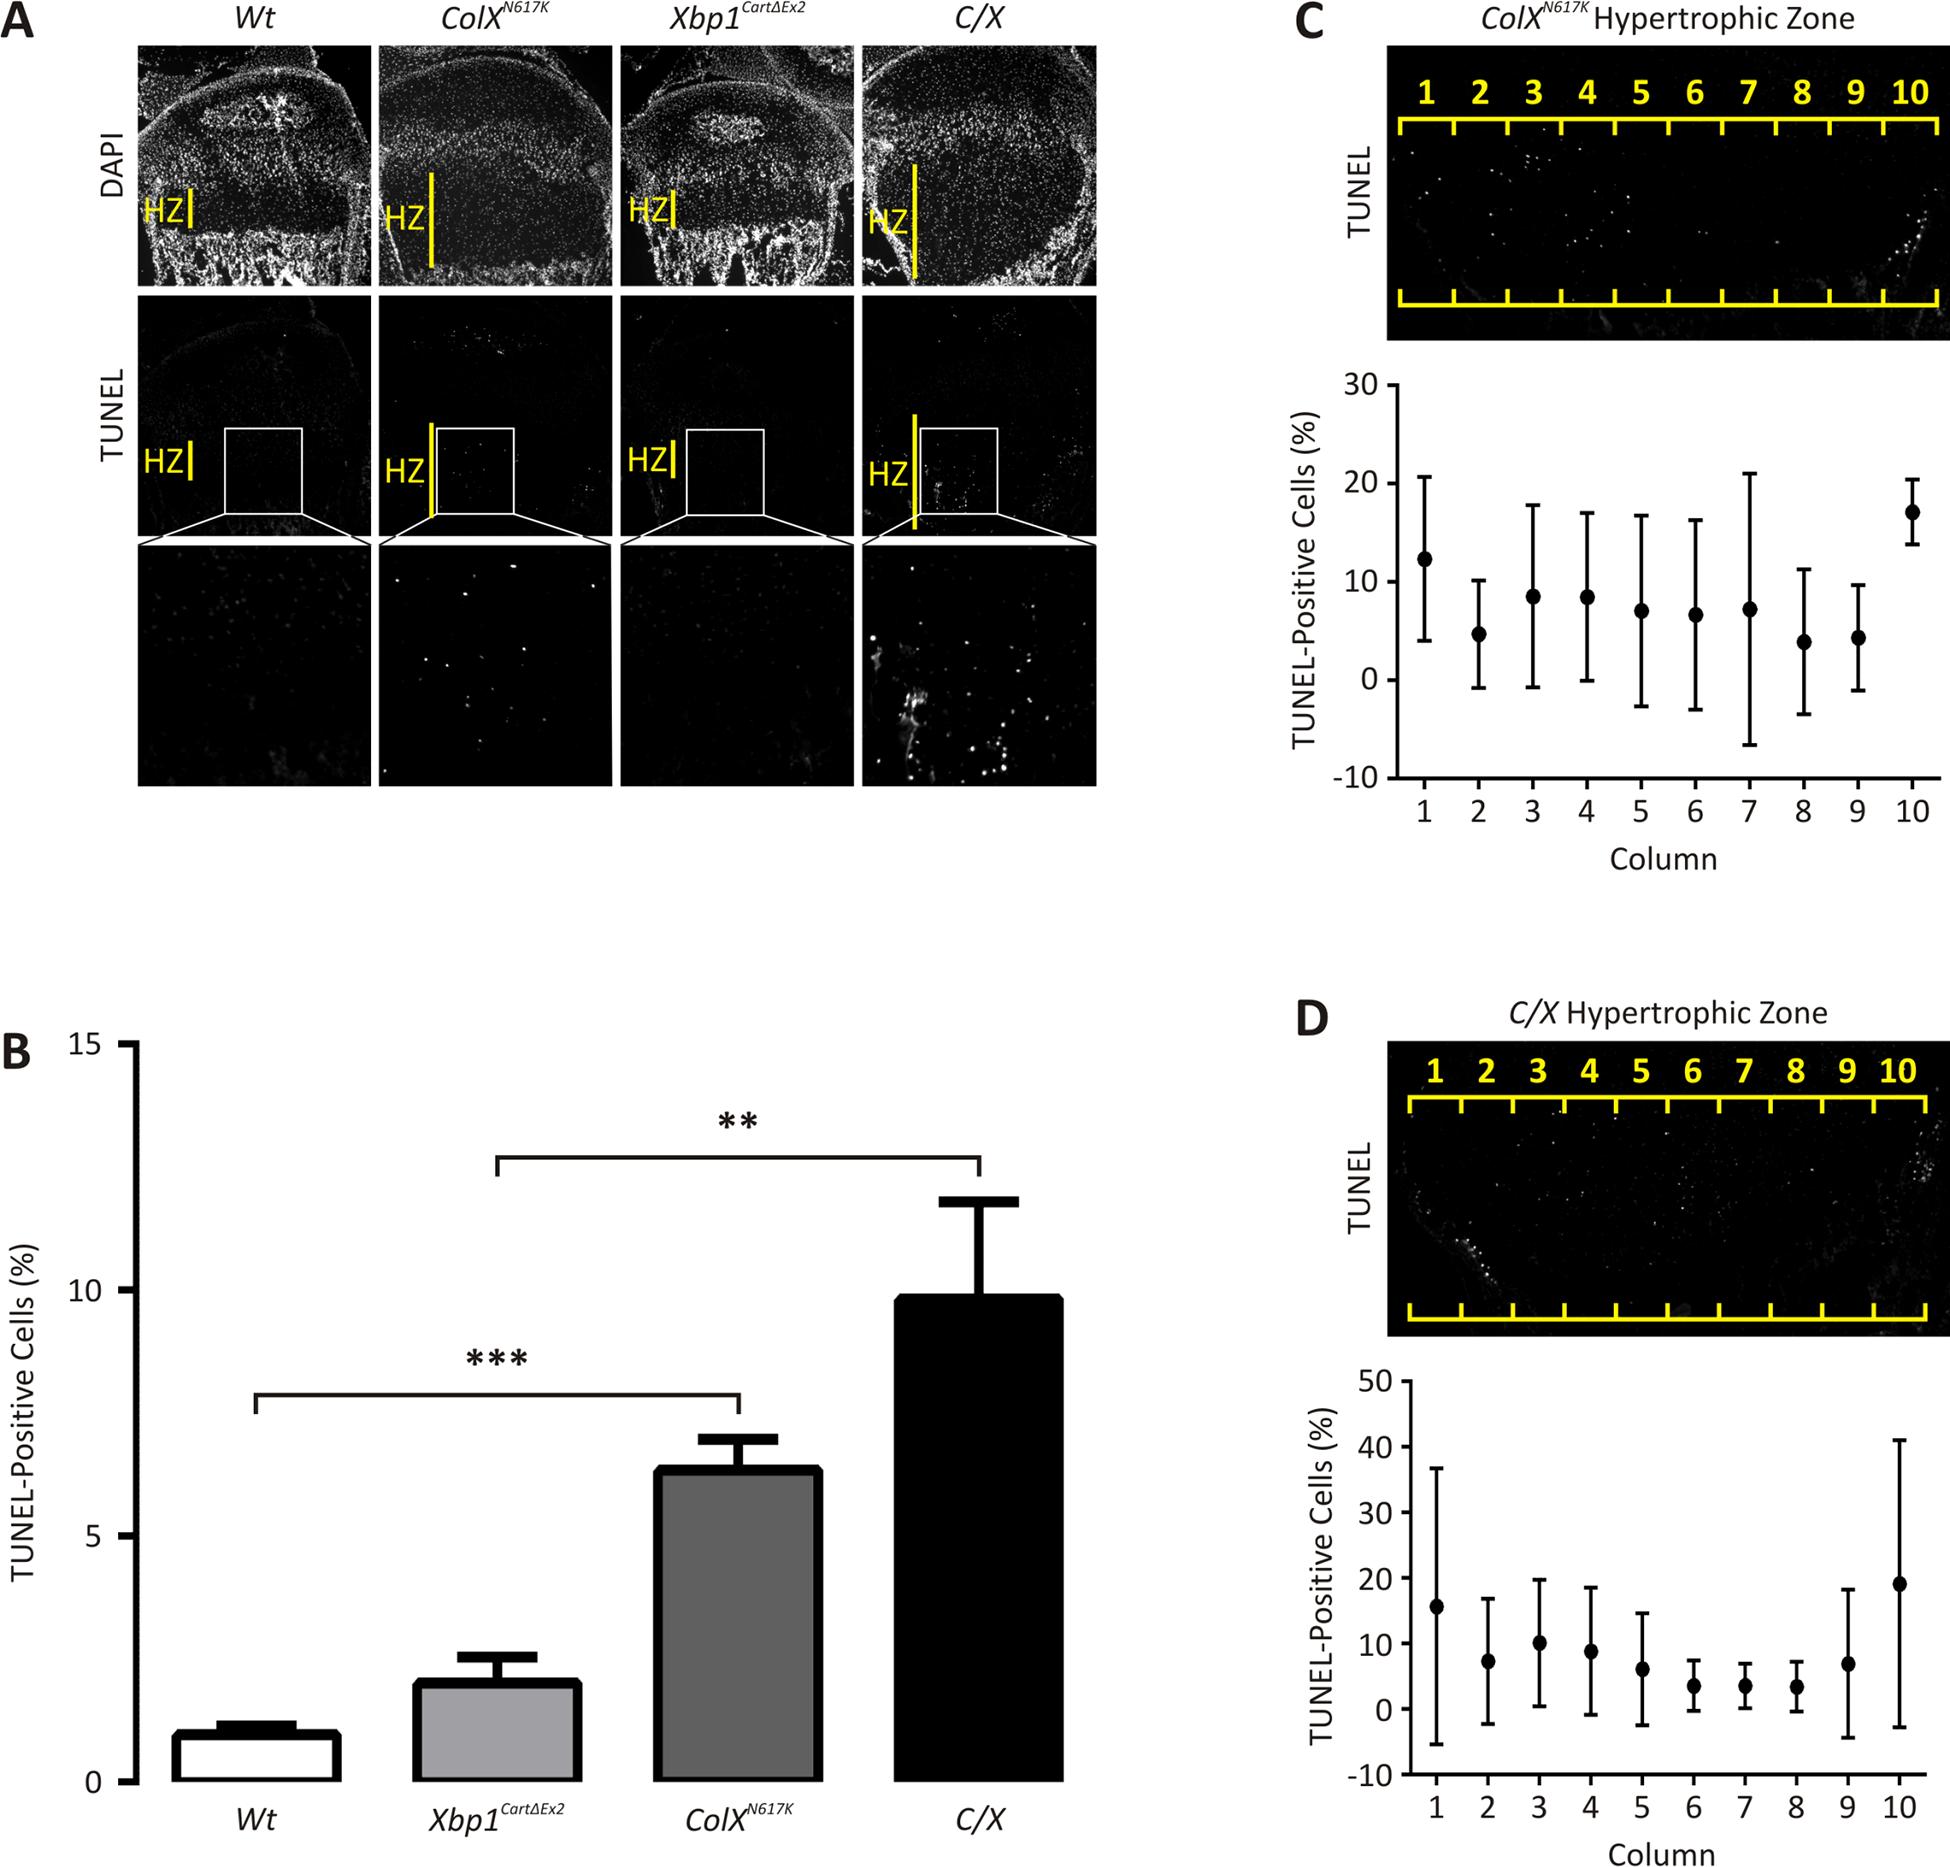 Apoptosis is elevated in 2 week <i>ColX</i><sup><i>N617K</i></sup> and <i>C/X</i> growth plate cartilage.